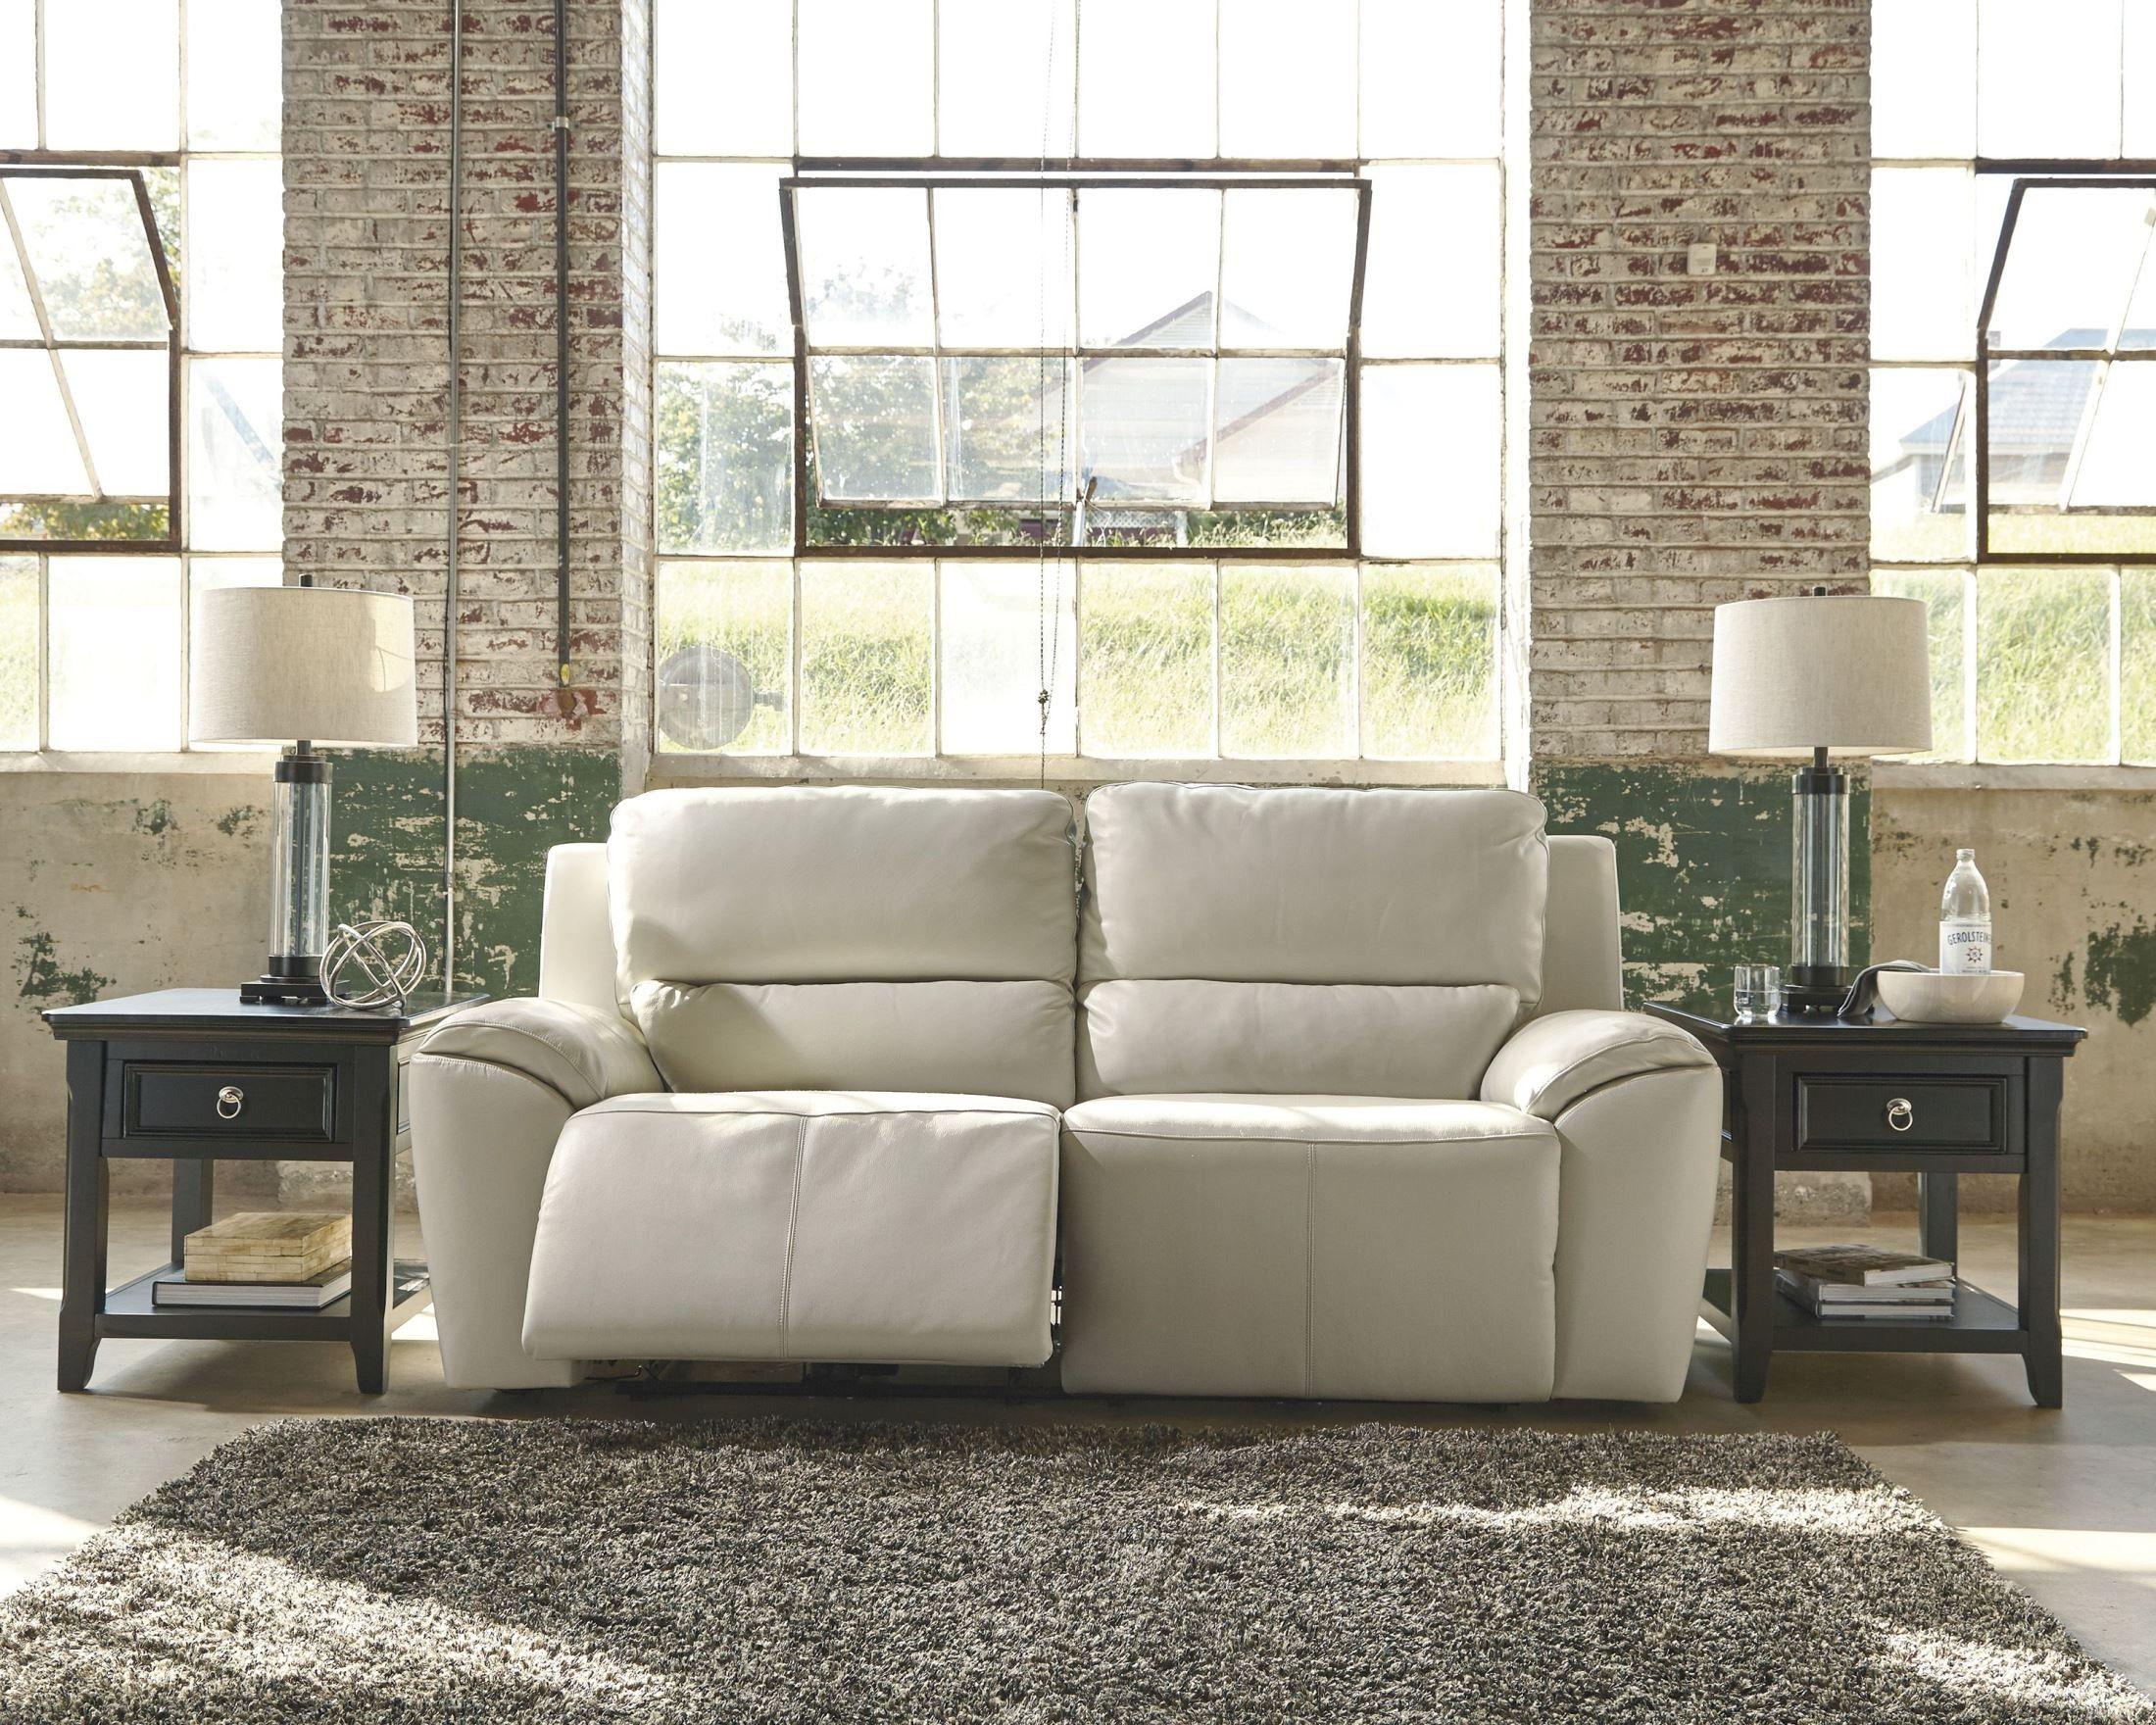 Innenarchitektur wohnzimmer lila grüne couch sofa welt lila sofa blau leder sofa leder chesterfield